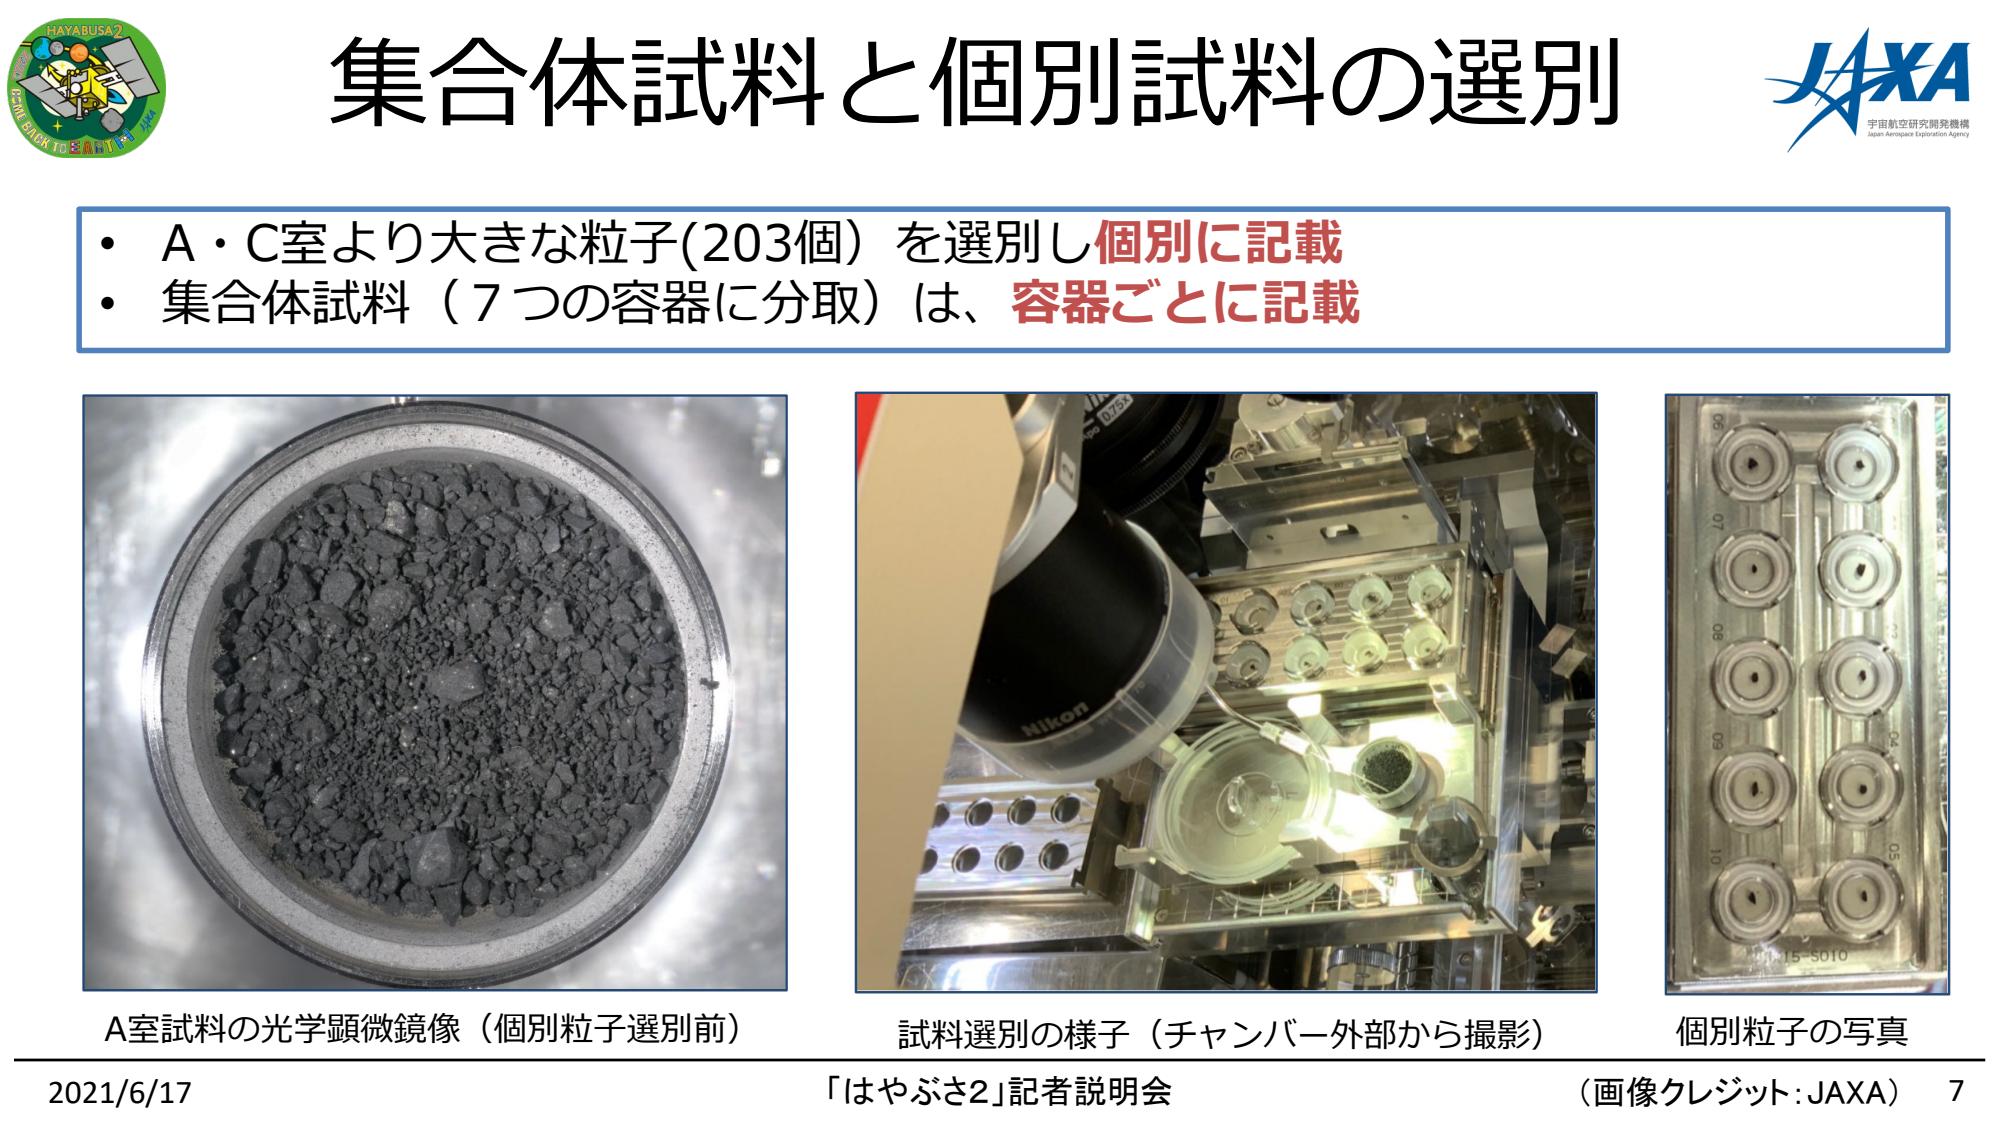 f:id:Imamura:20210617130145p:plain